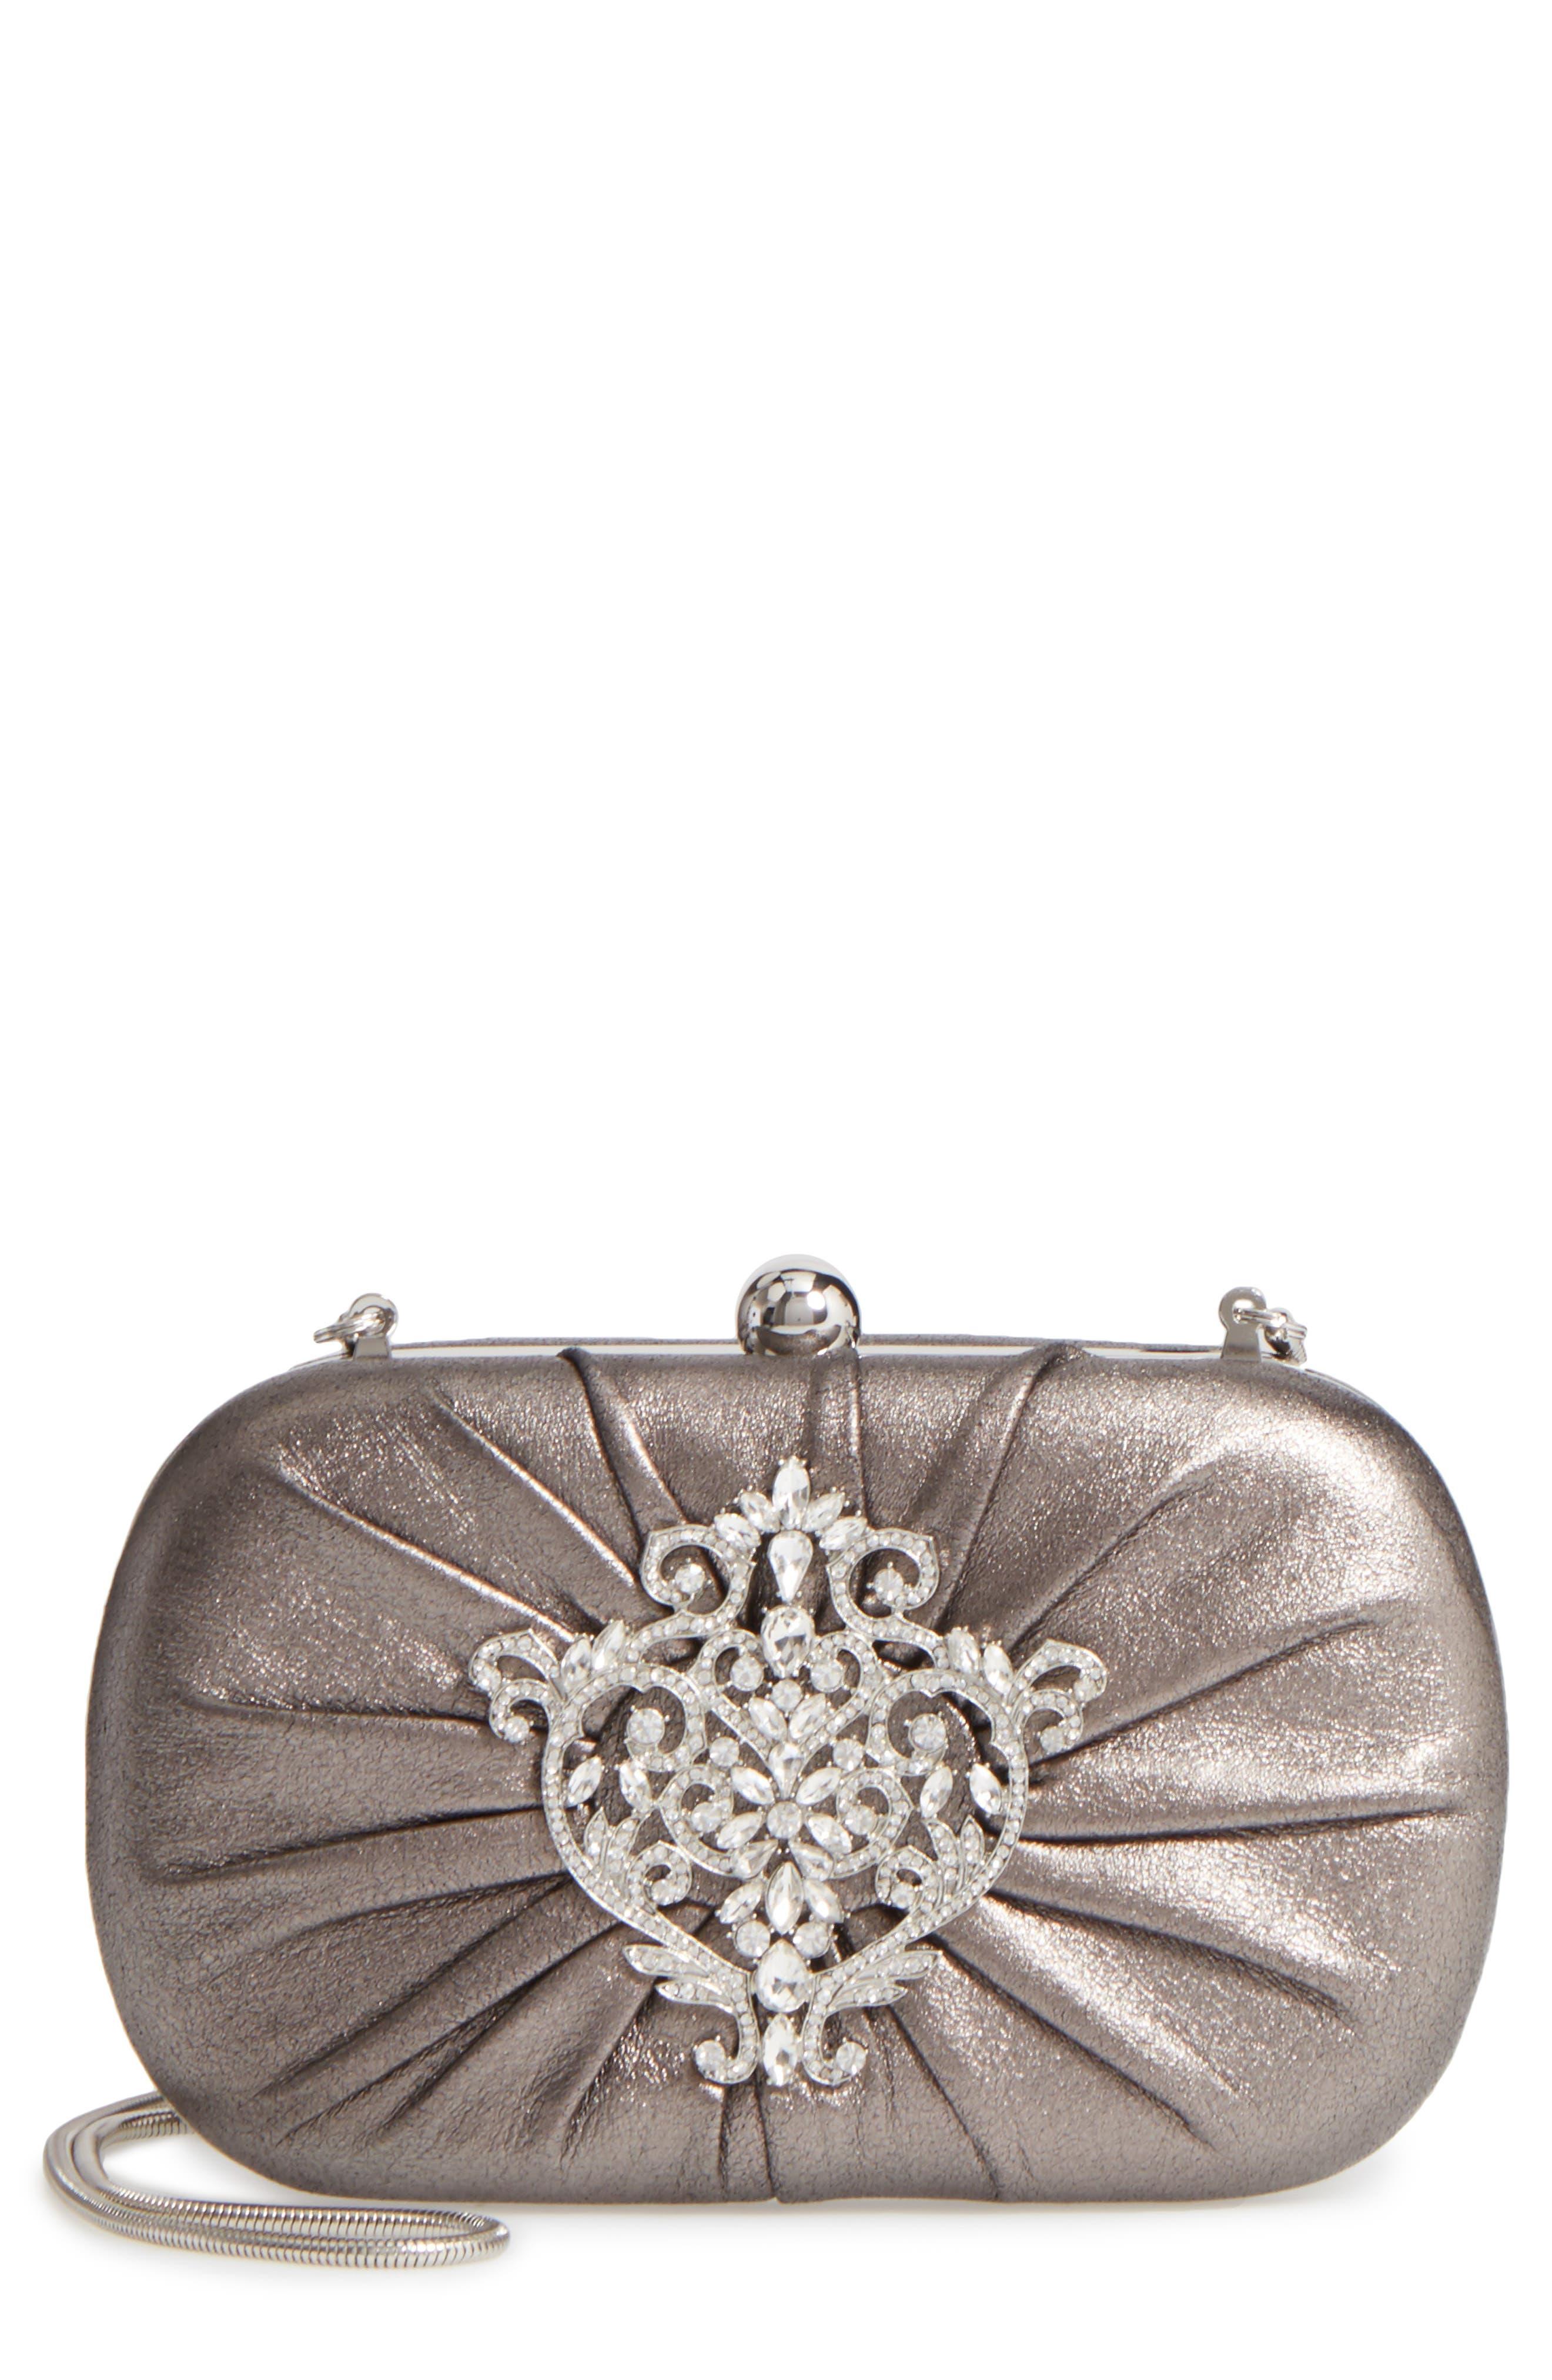 Diva Metallic Leather Clutch,                             Main thumbnail 1, color,                             040